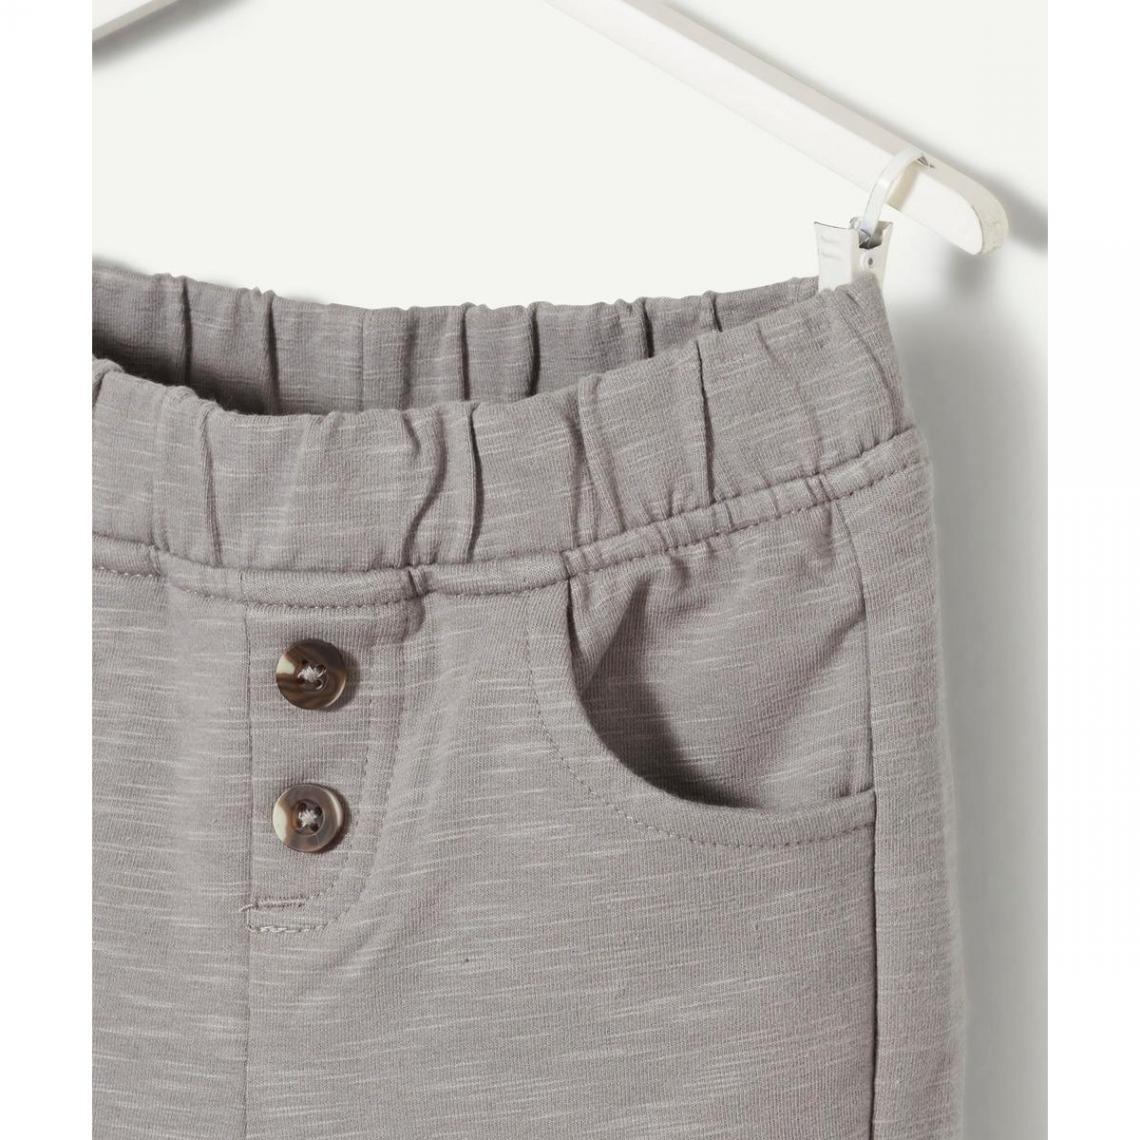 68e6c98ab43d6 Pantalon   Jean   Jogging Tape a l oeil